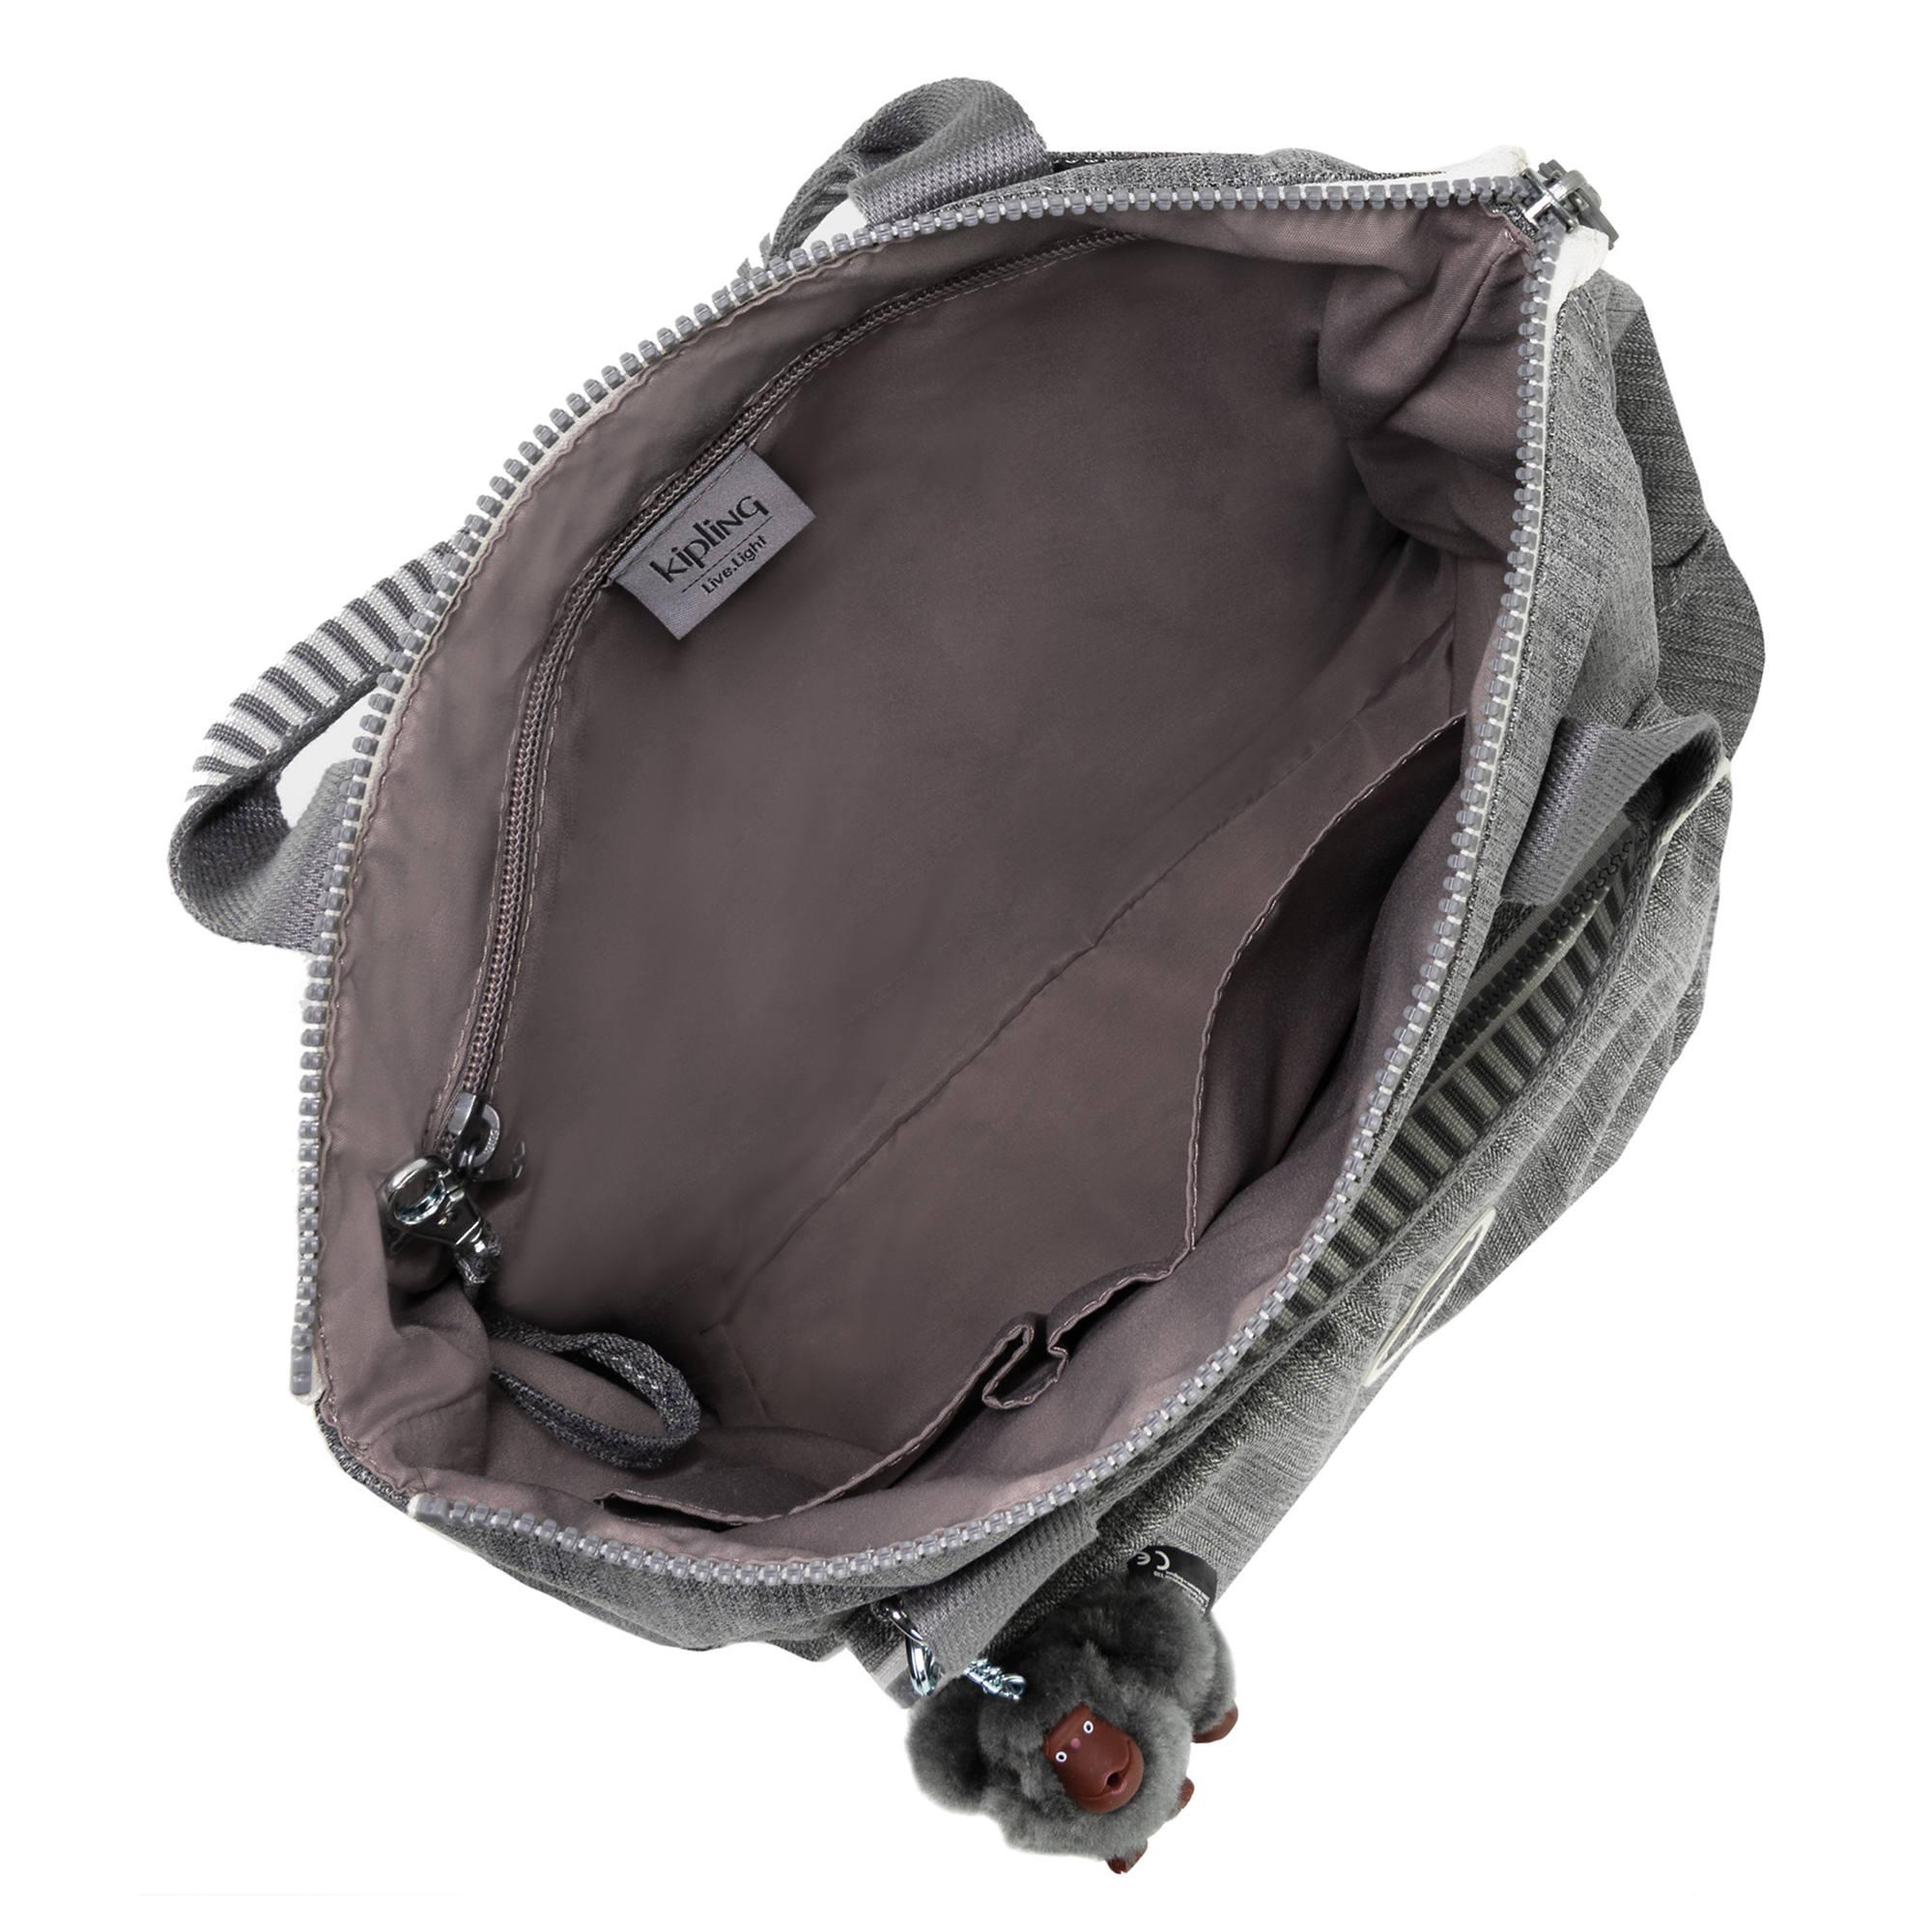 Kipling-Alvy-2-In-1-Convertible-Tote-Bag-Backpack miniatura 27